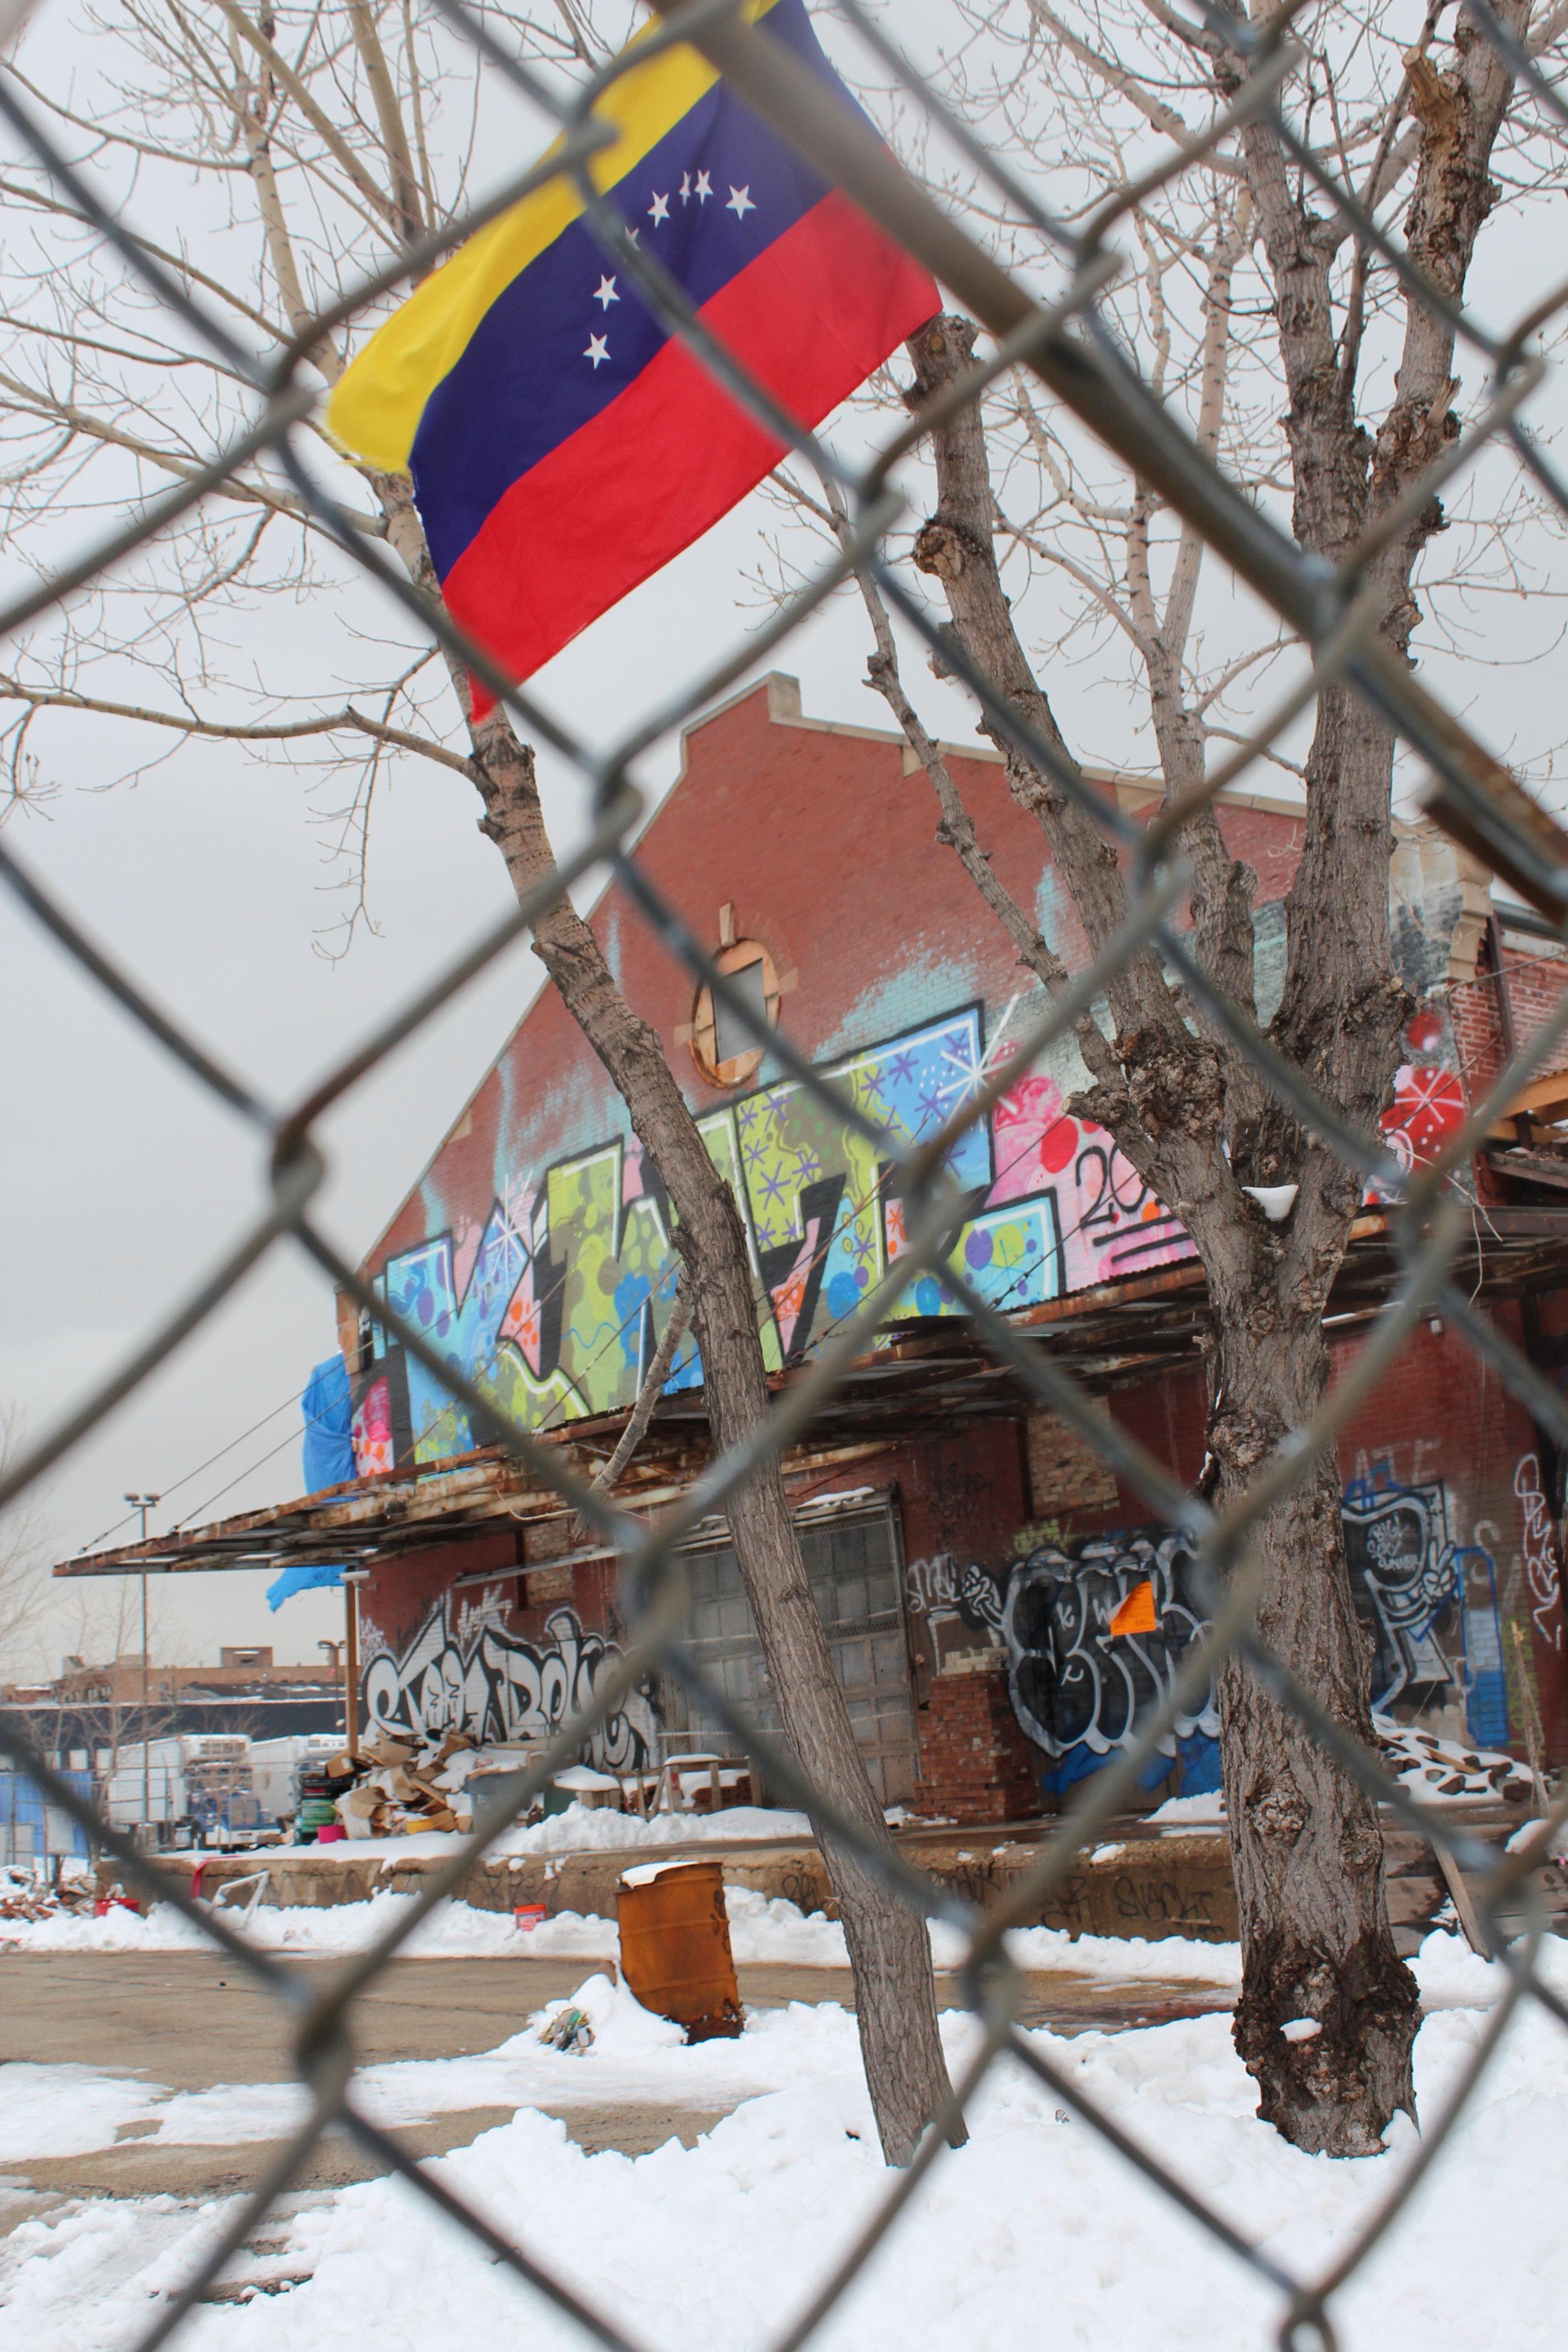 Venezuelan flag flies the day after their President, Hugo Chavez, passed. Graffiti, Chicago.